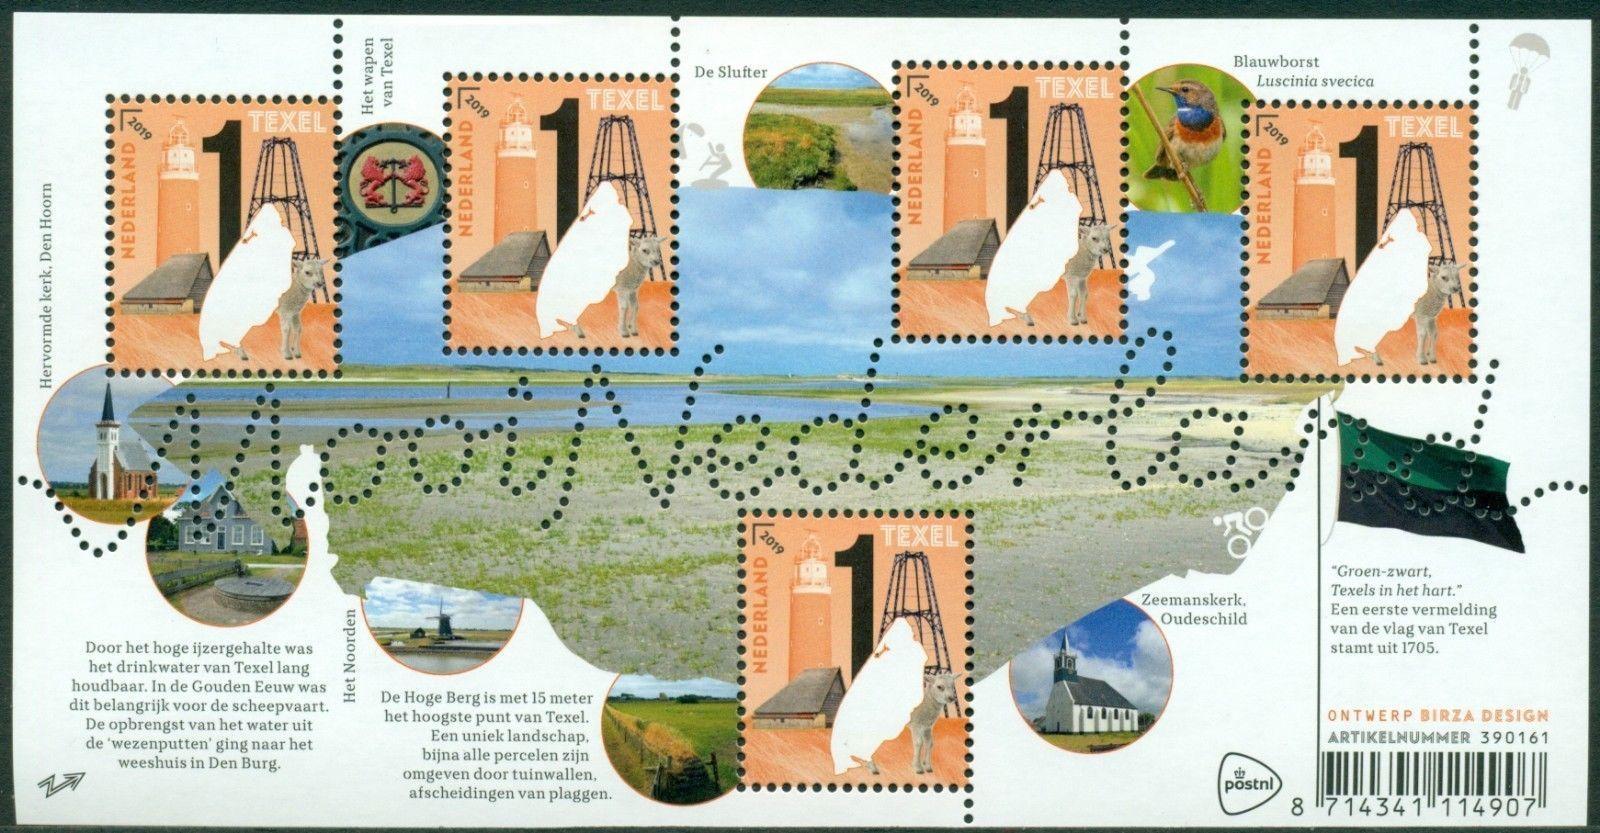 Netherlands - Beautiful Netherlands: Texel (January 2, 2019) miniature sheet of 5